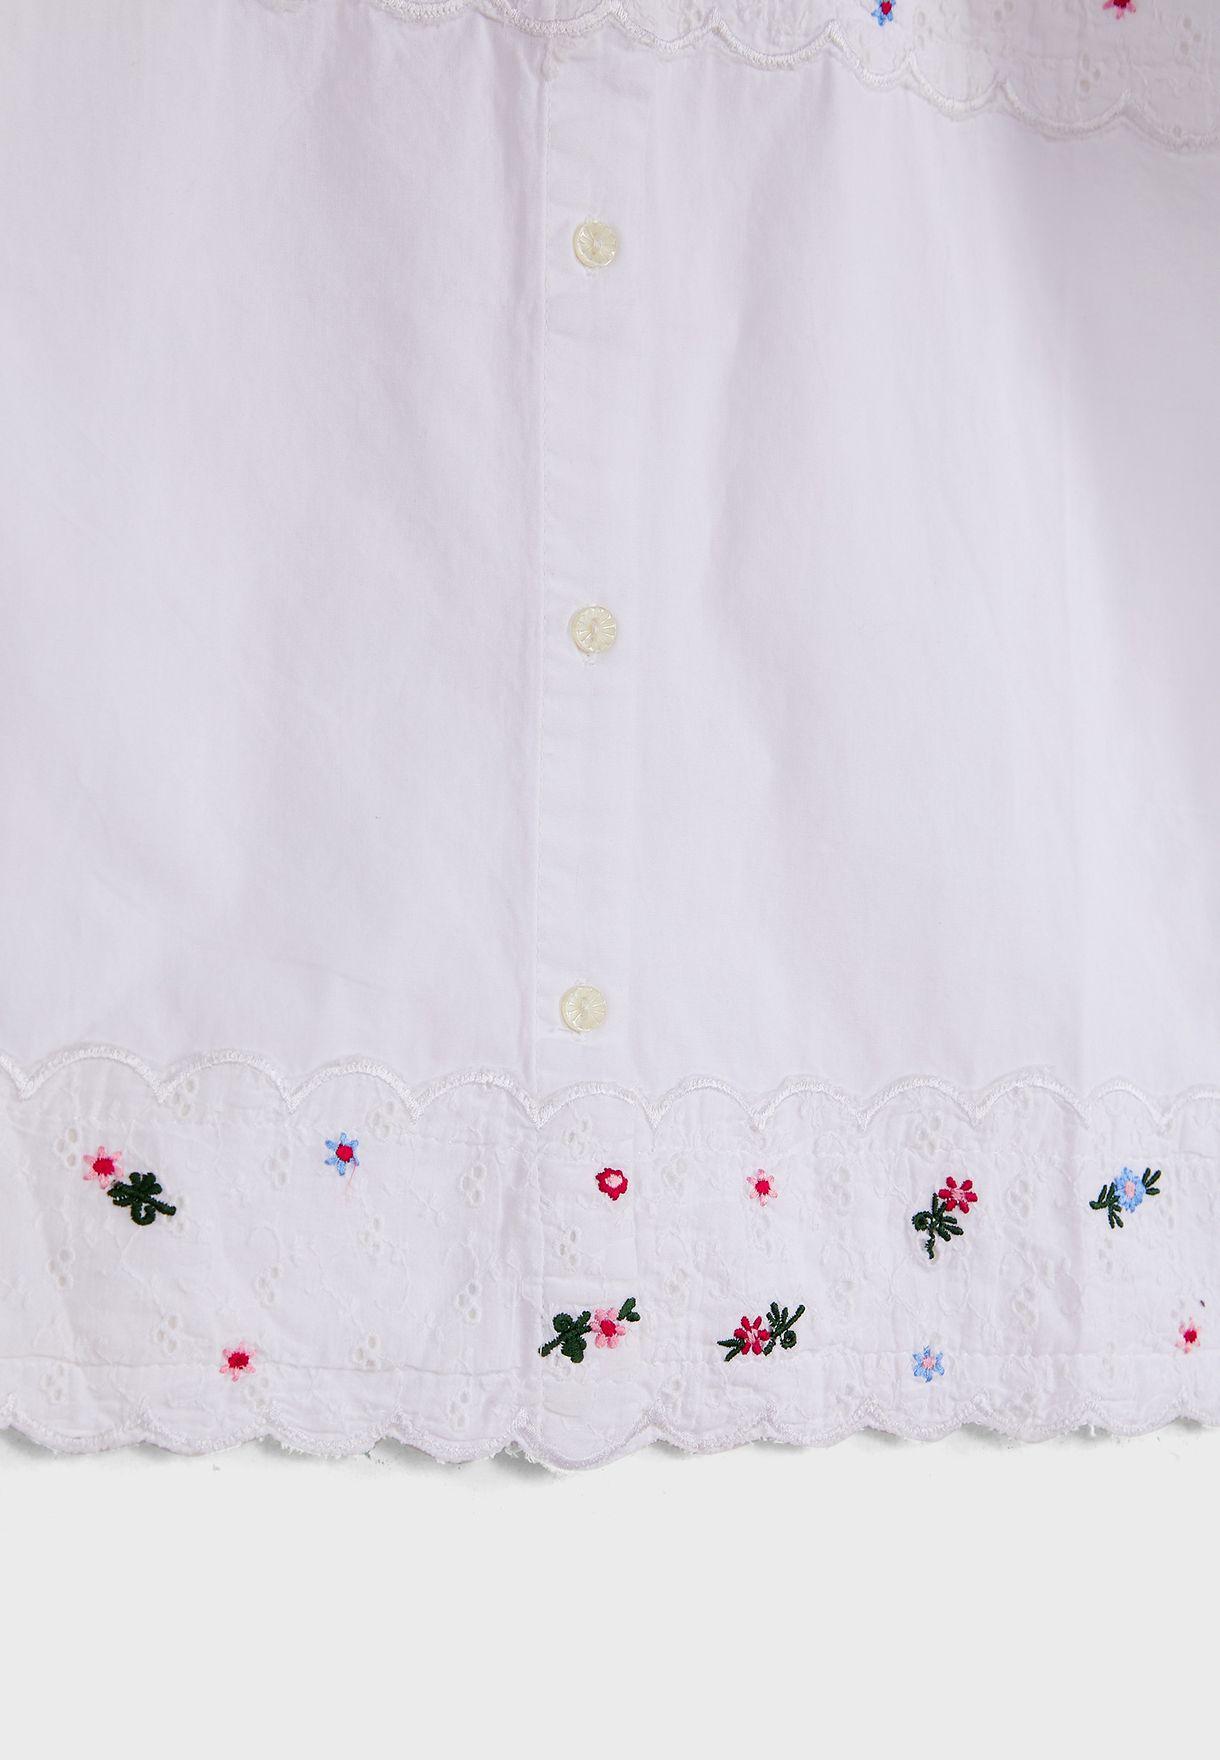 قميص بتطريز وازهار